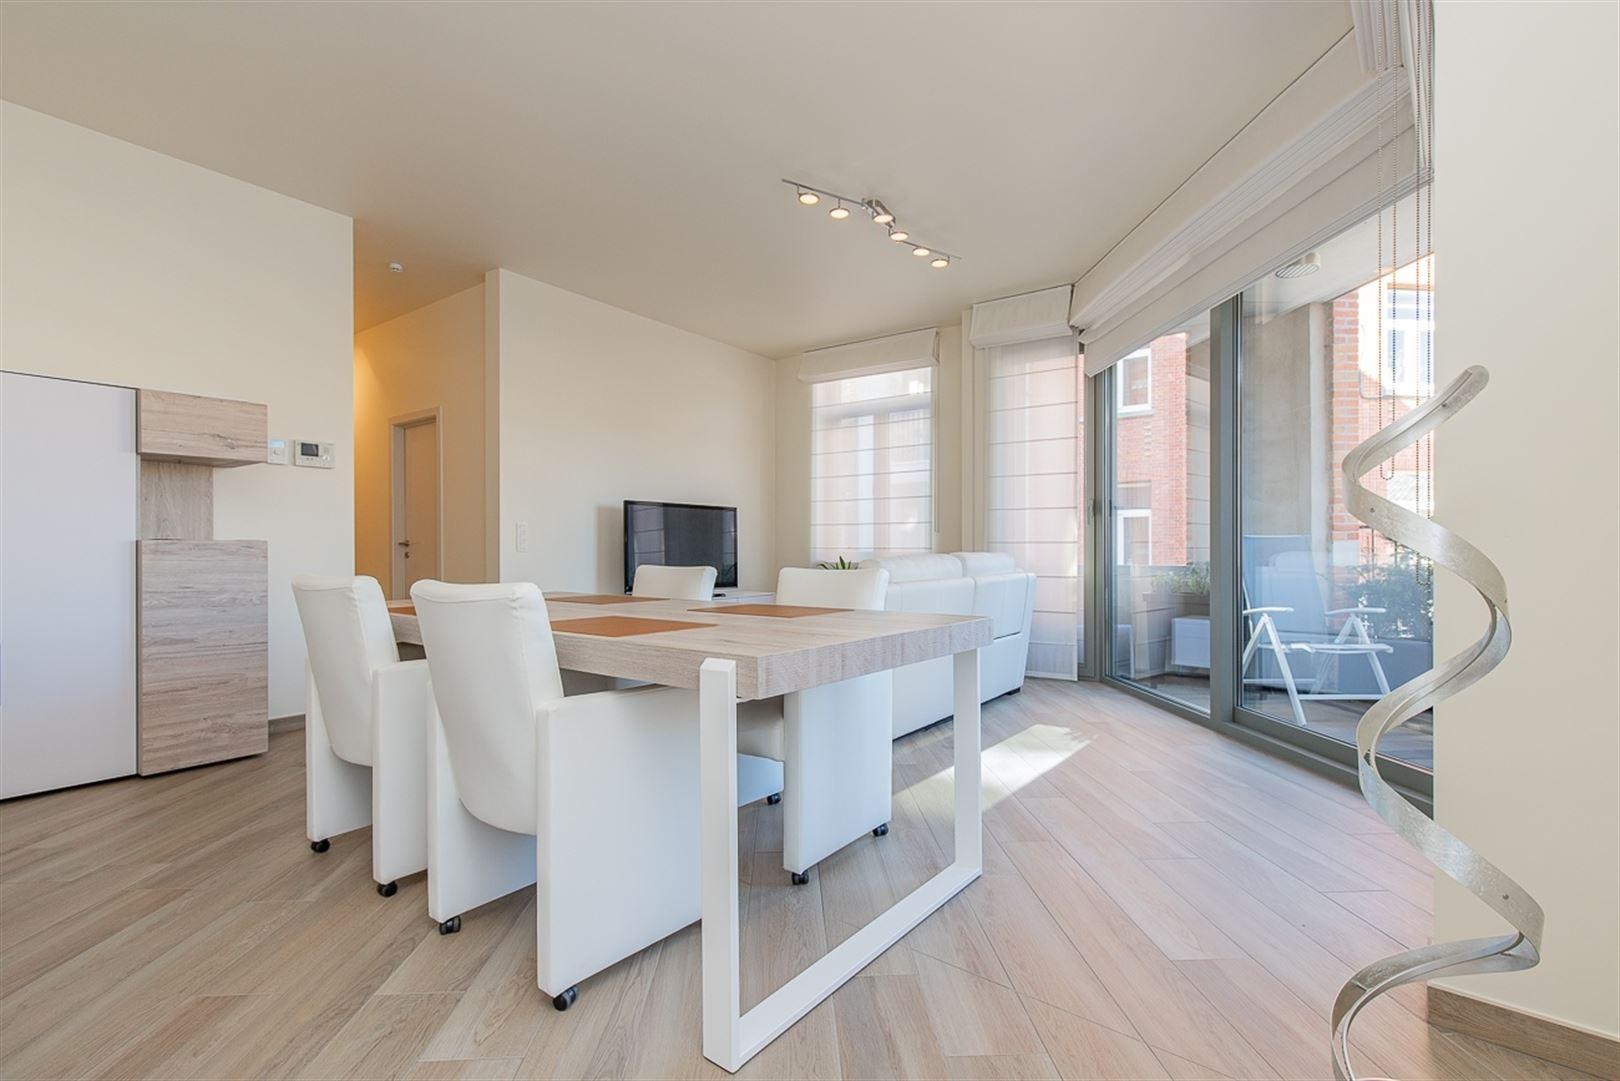 Foto 1 : Appartement te 9200 DENDERMONDE (België) - Prijs € 299.000